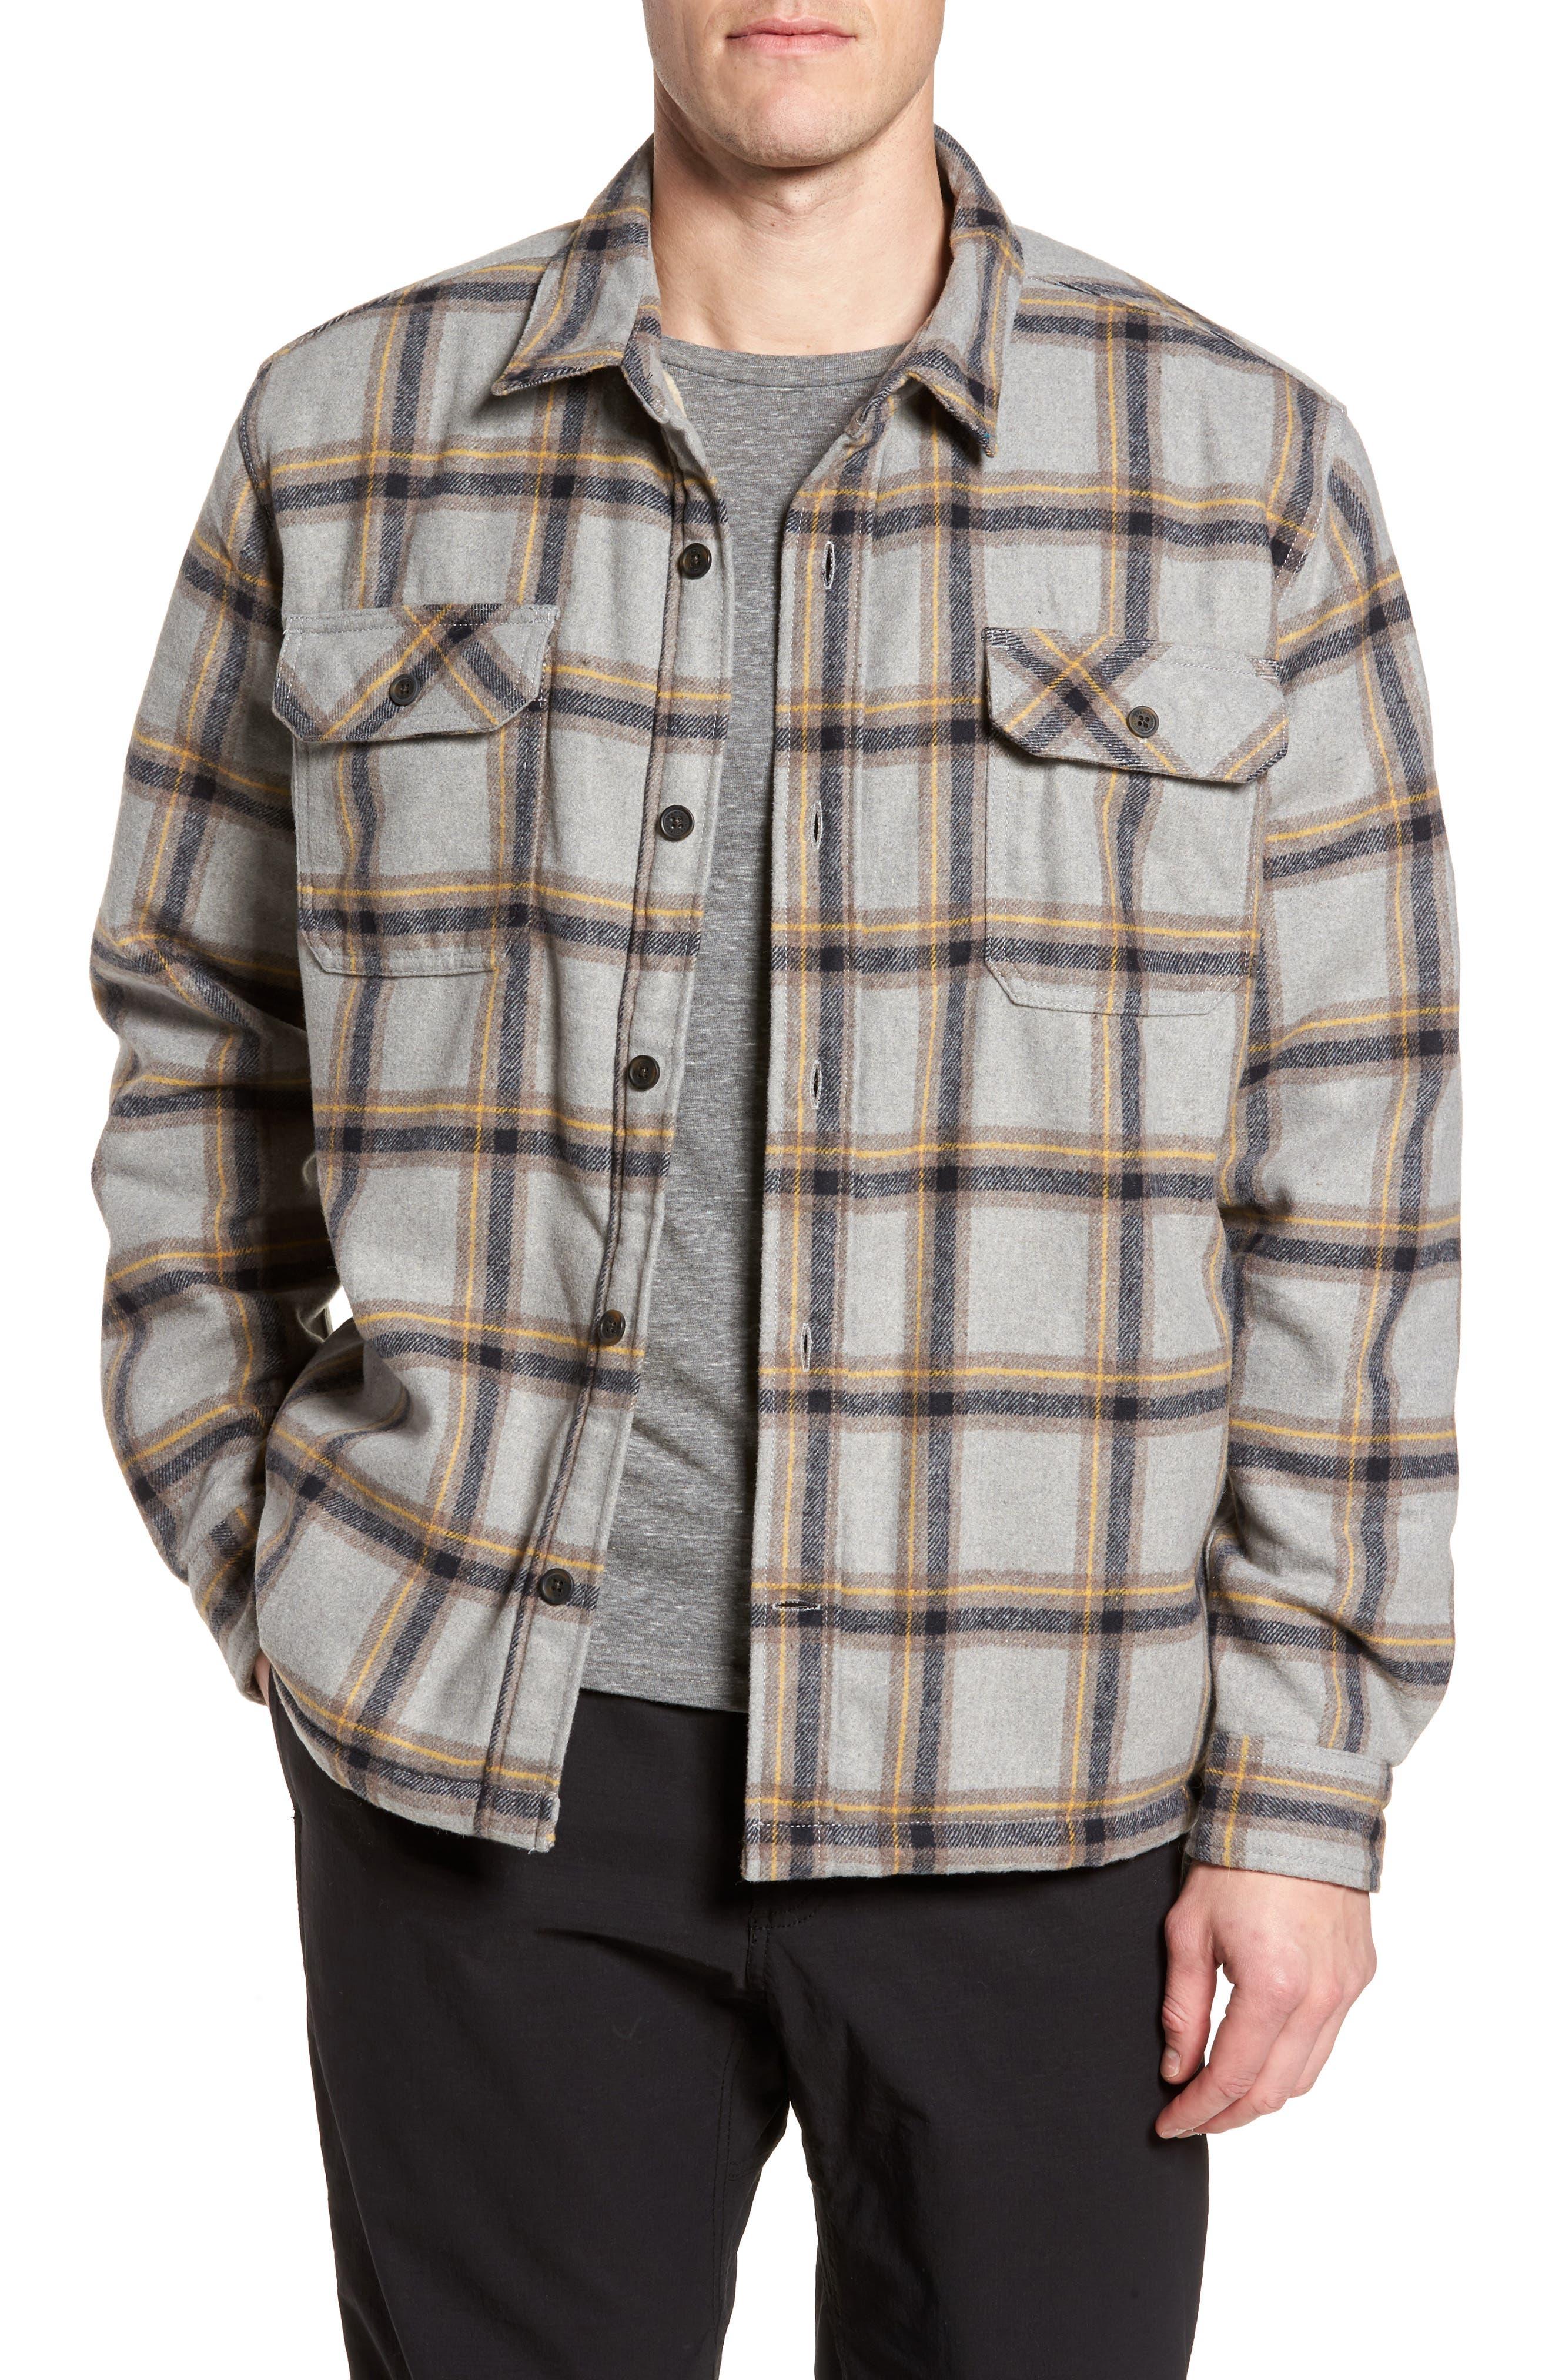 Tough Guy Plush Lined Flannel Shirt Jacket,                             Main thumbnail 1, color,                             020